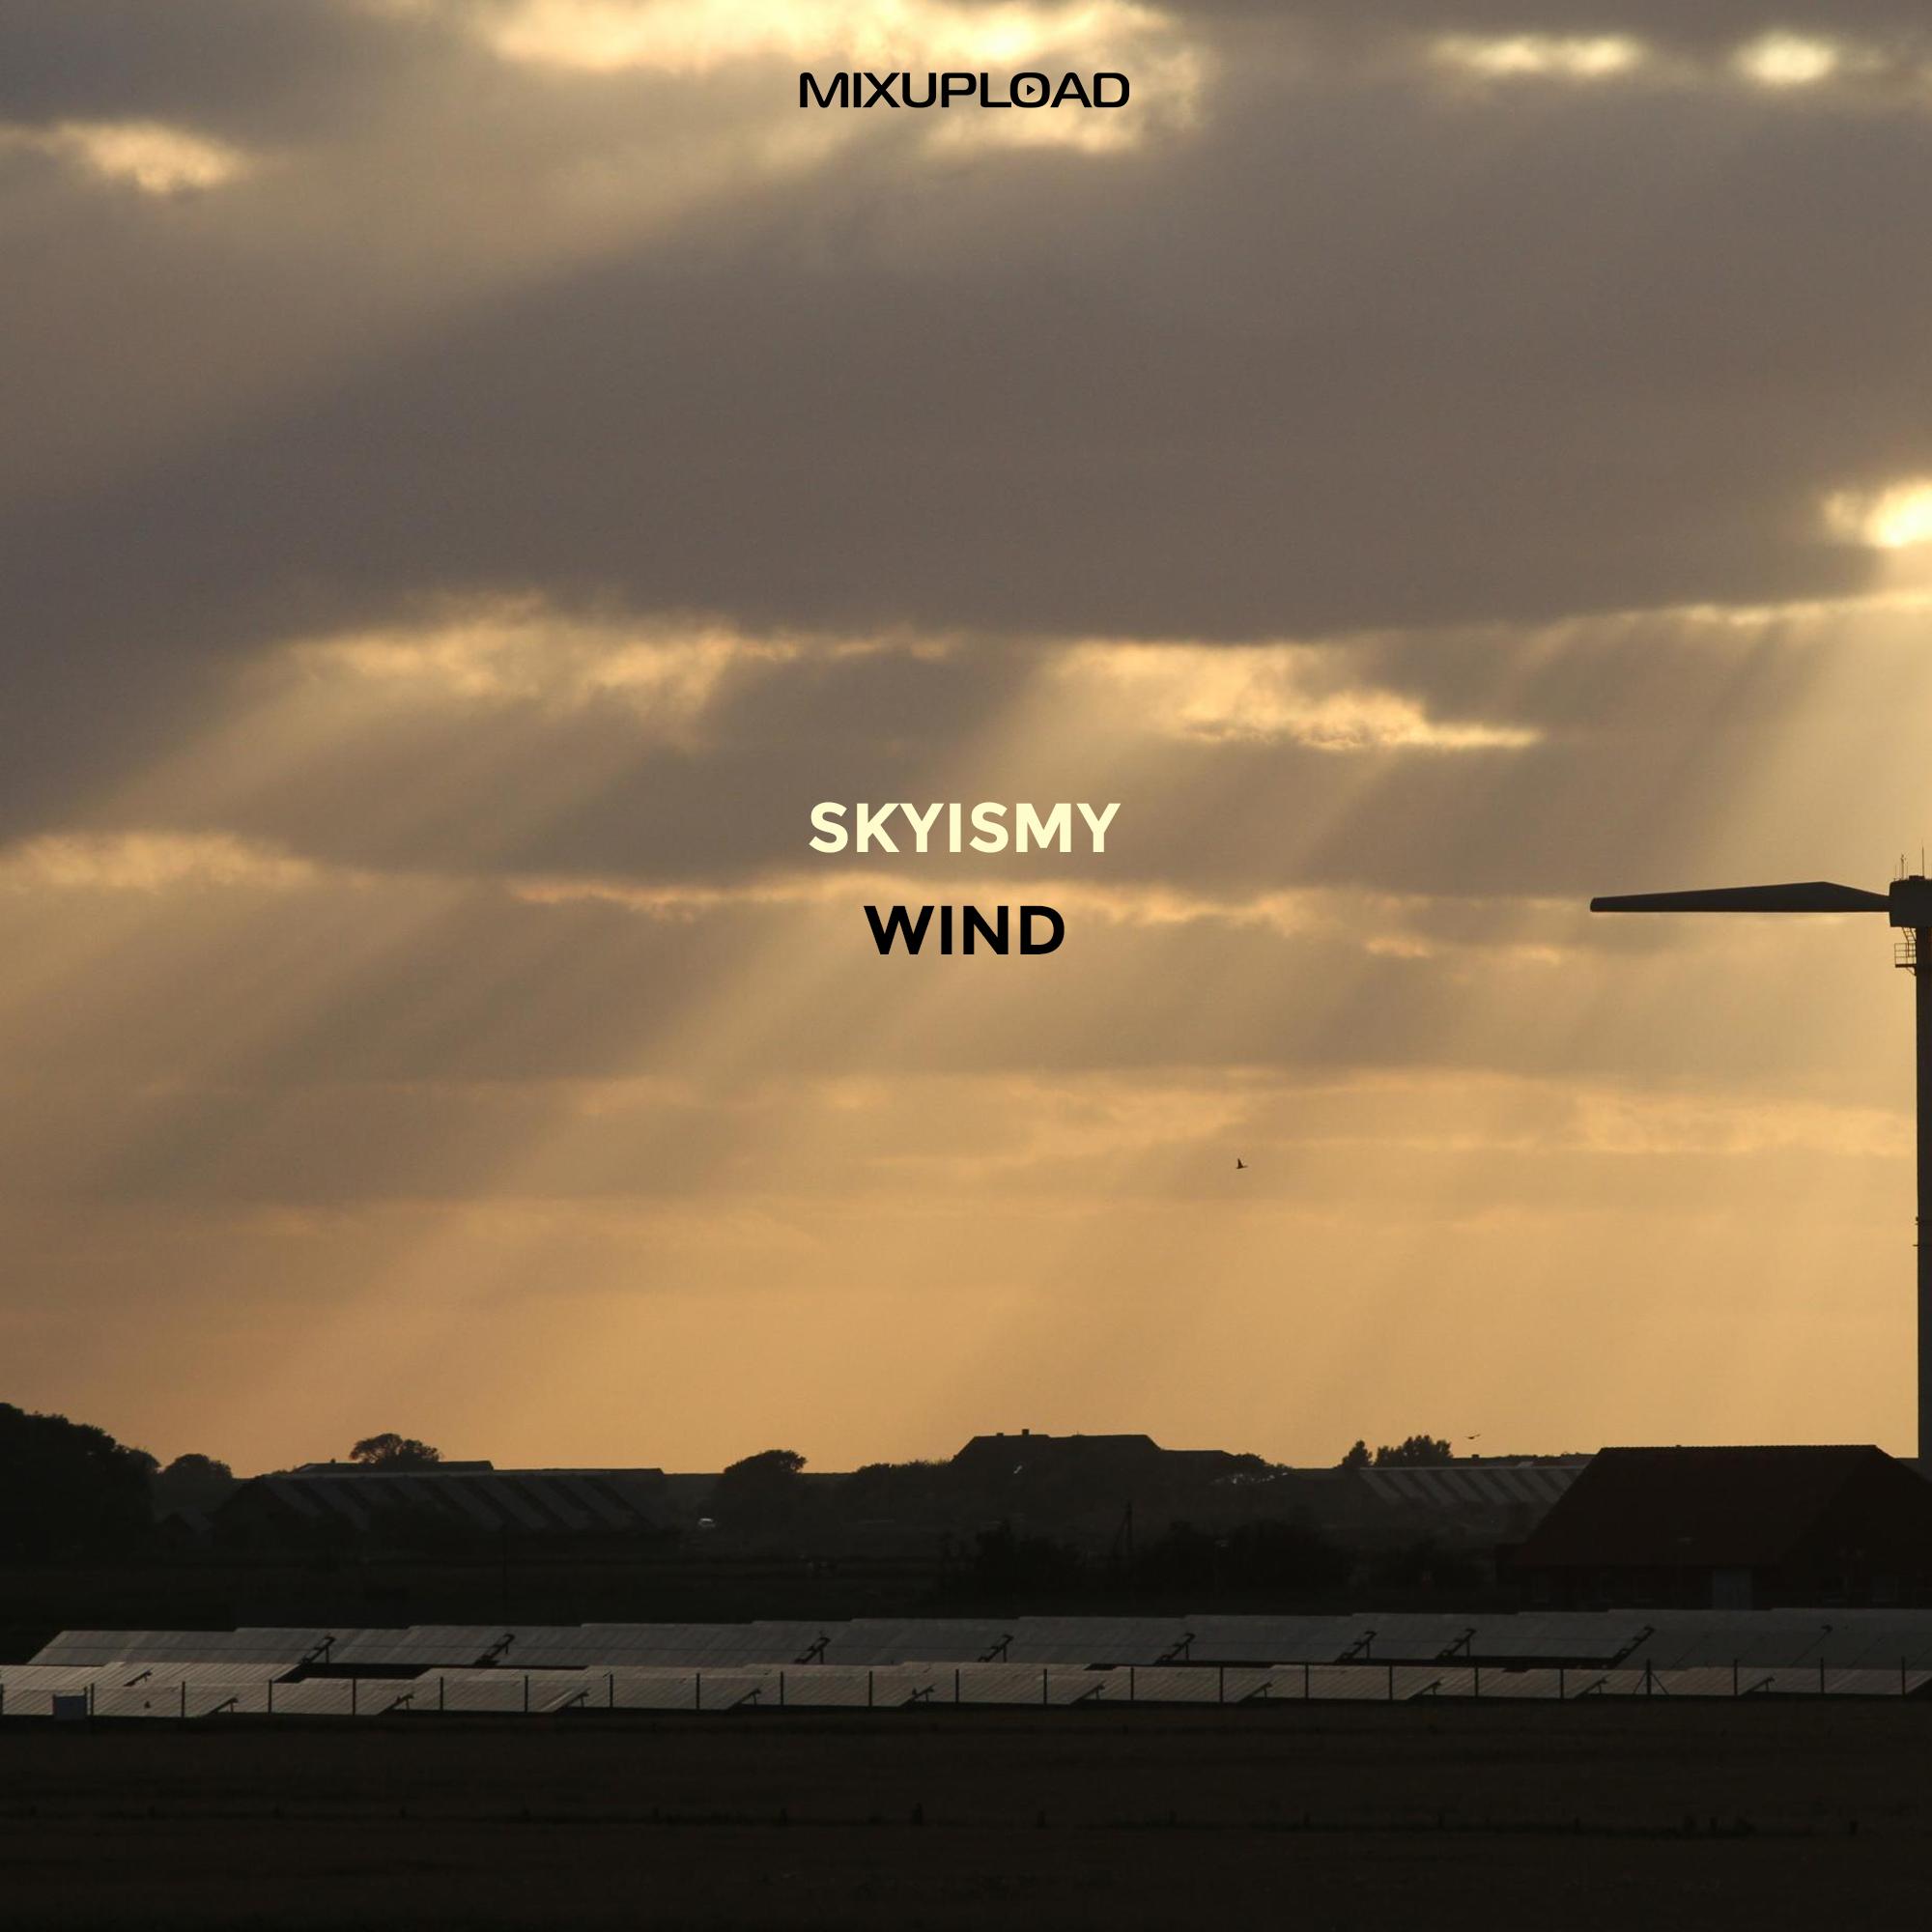 Skyismy - Wind (Original Mix)